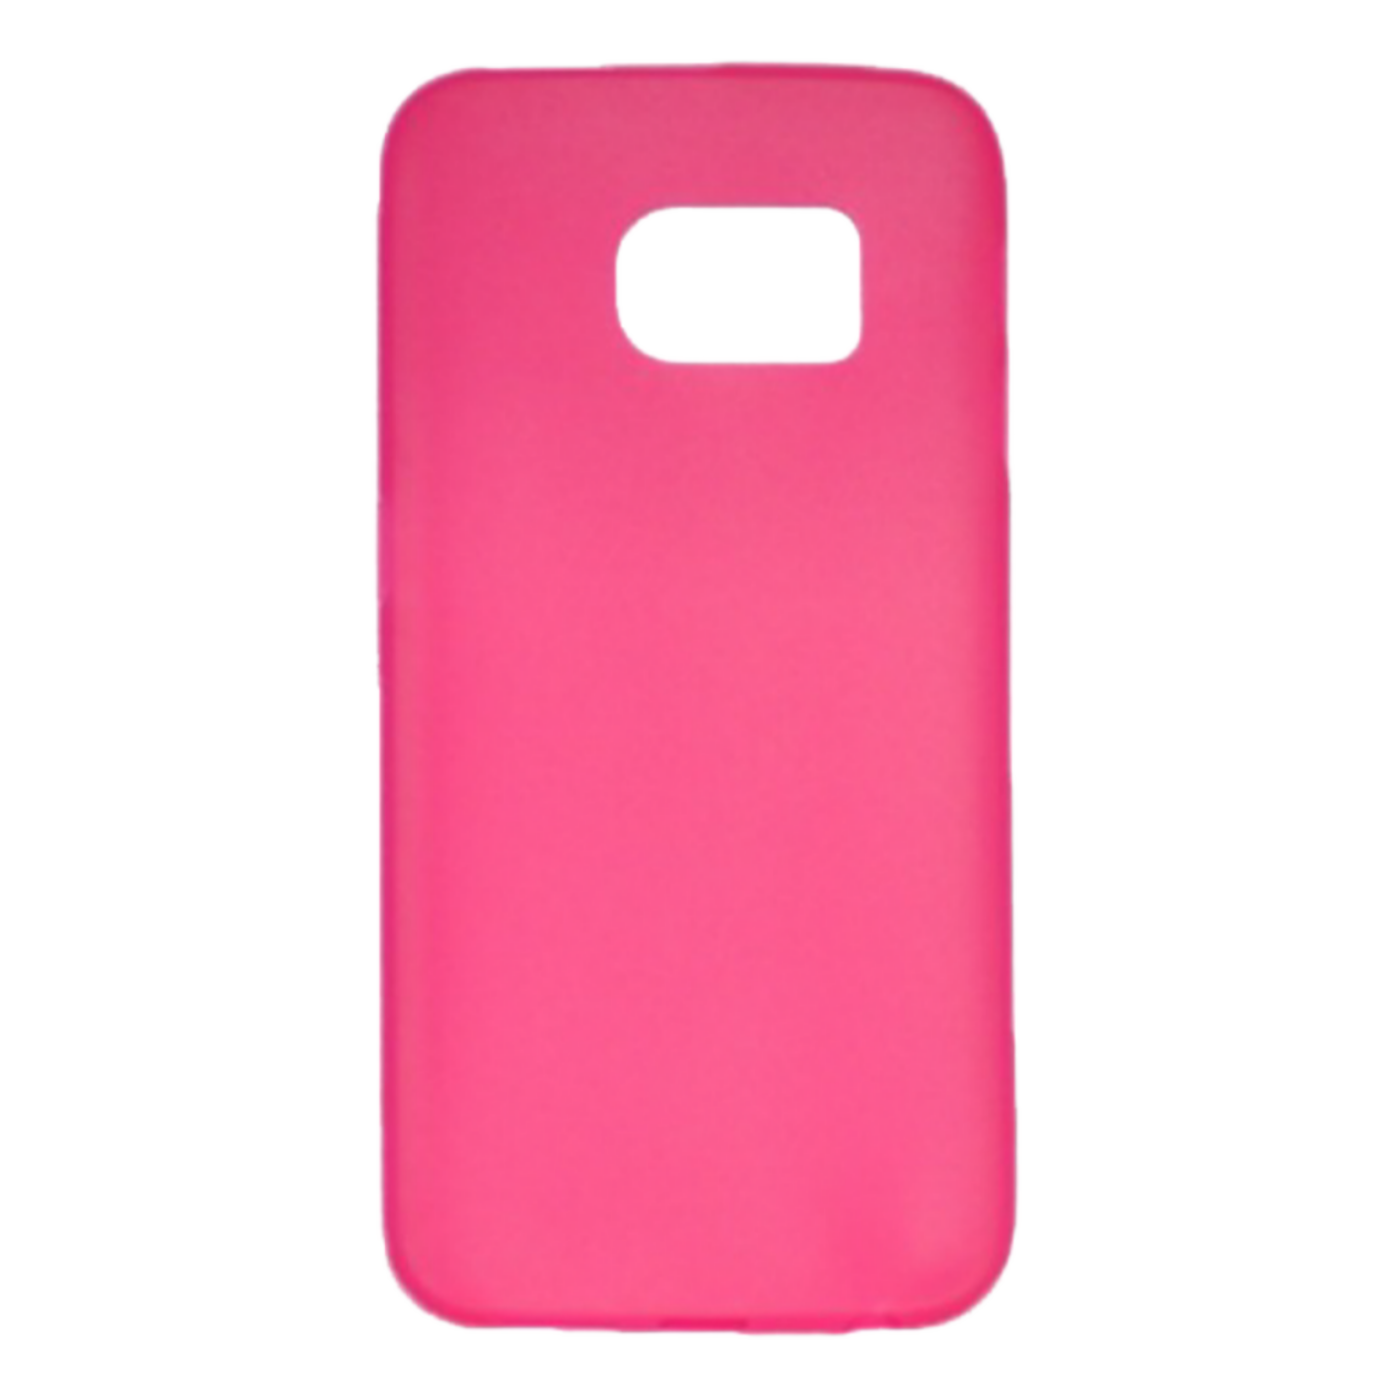 Futrola za mobitel Samsung S6 edge, silikonska, pink